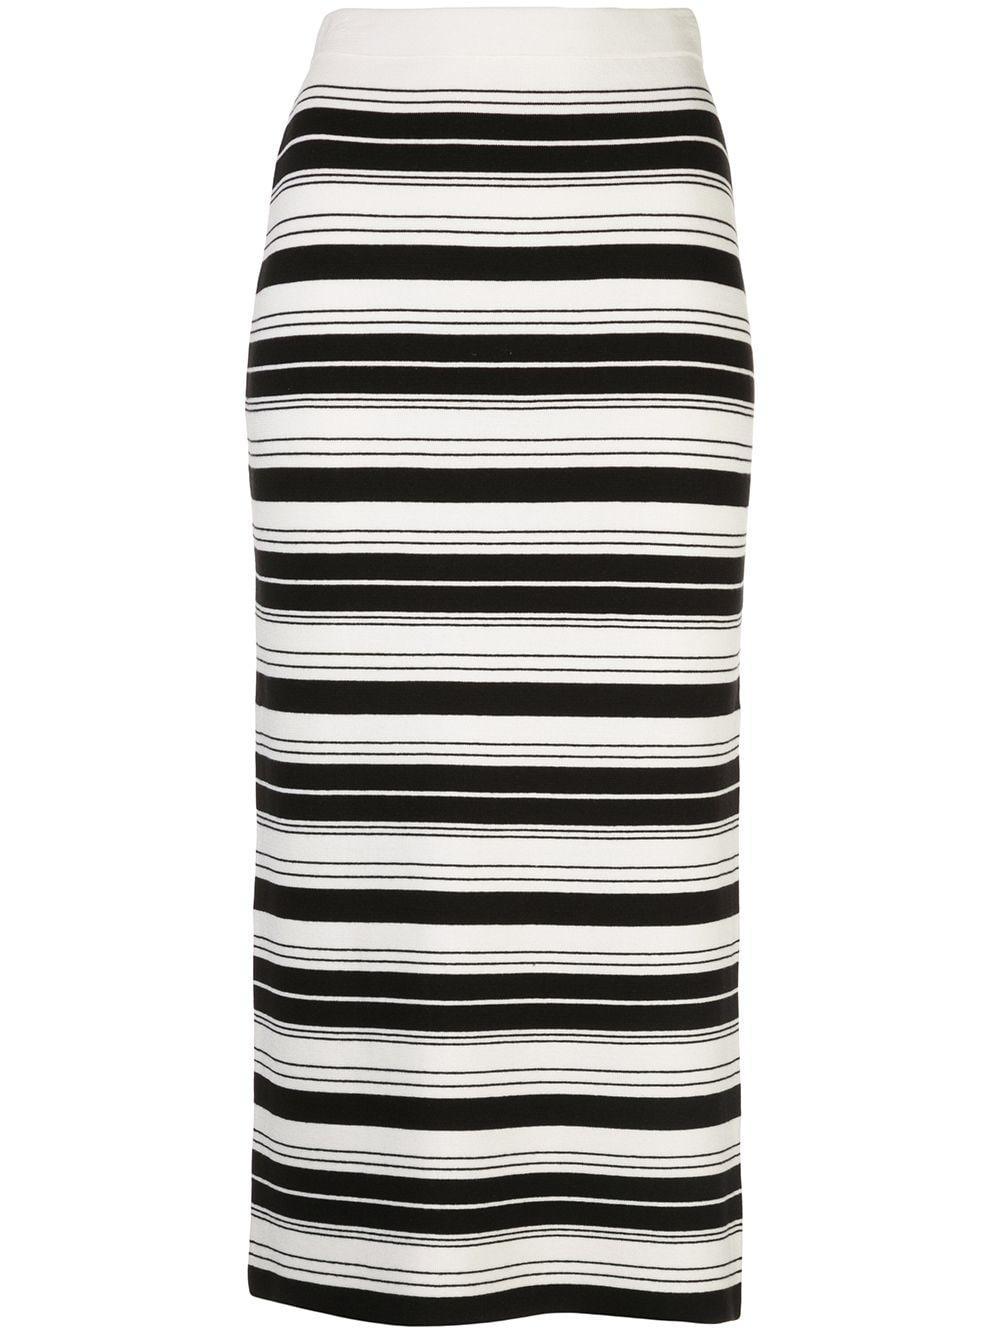 Proenza Schouler White Label юбка-карандаш в полоску